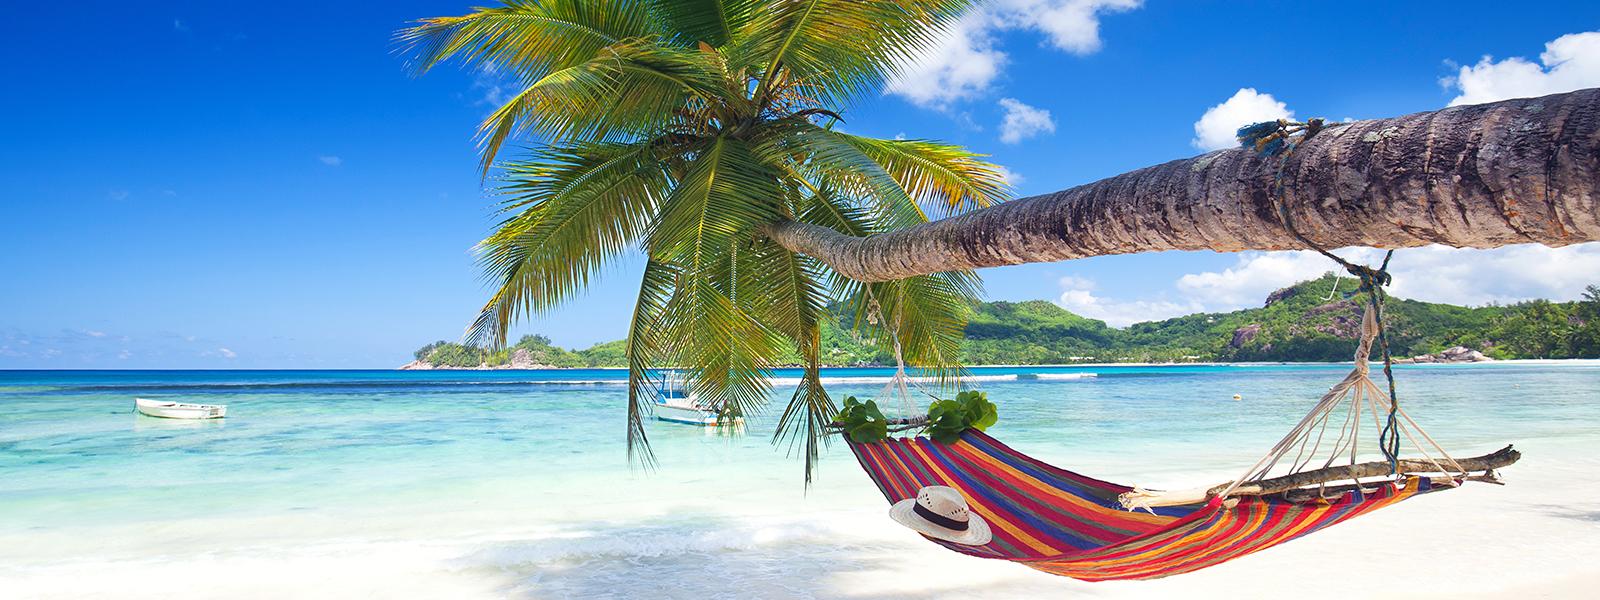 THE PERFECT CARIBBEAN PARADISE GETAWAY